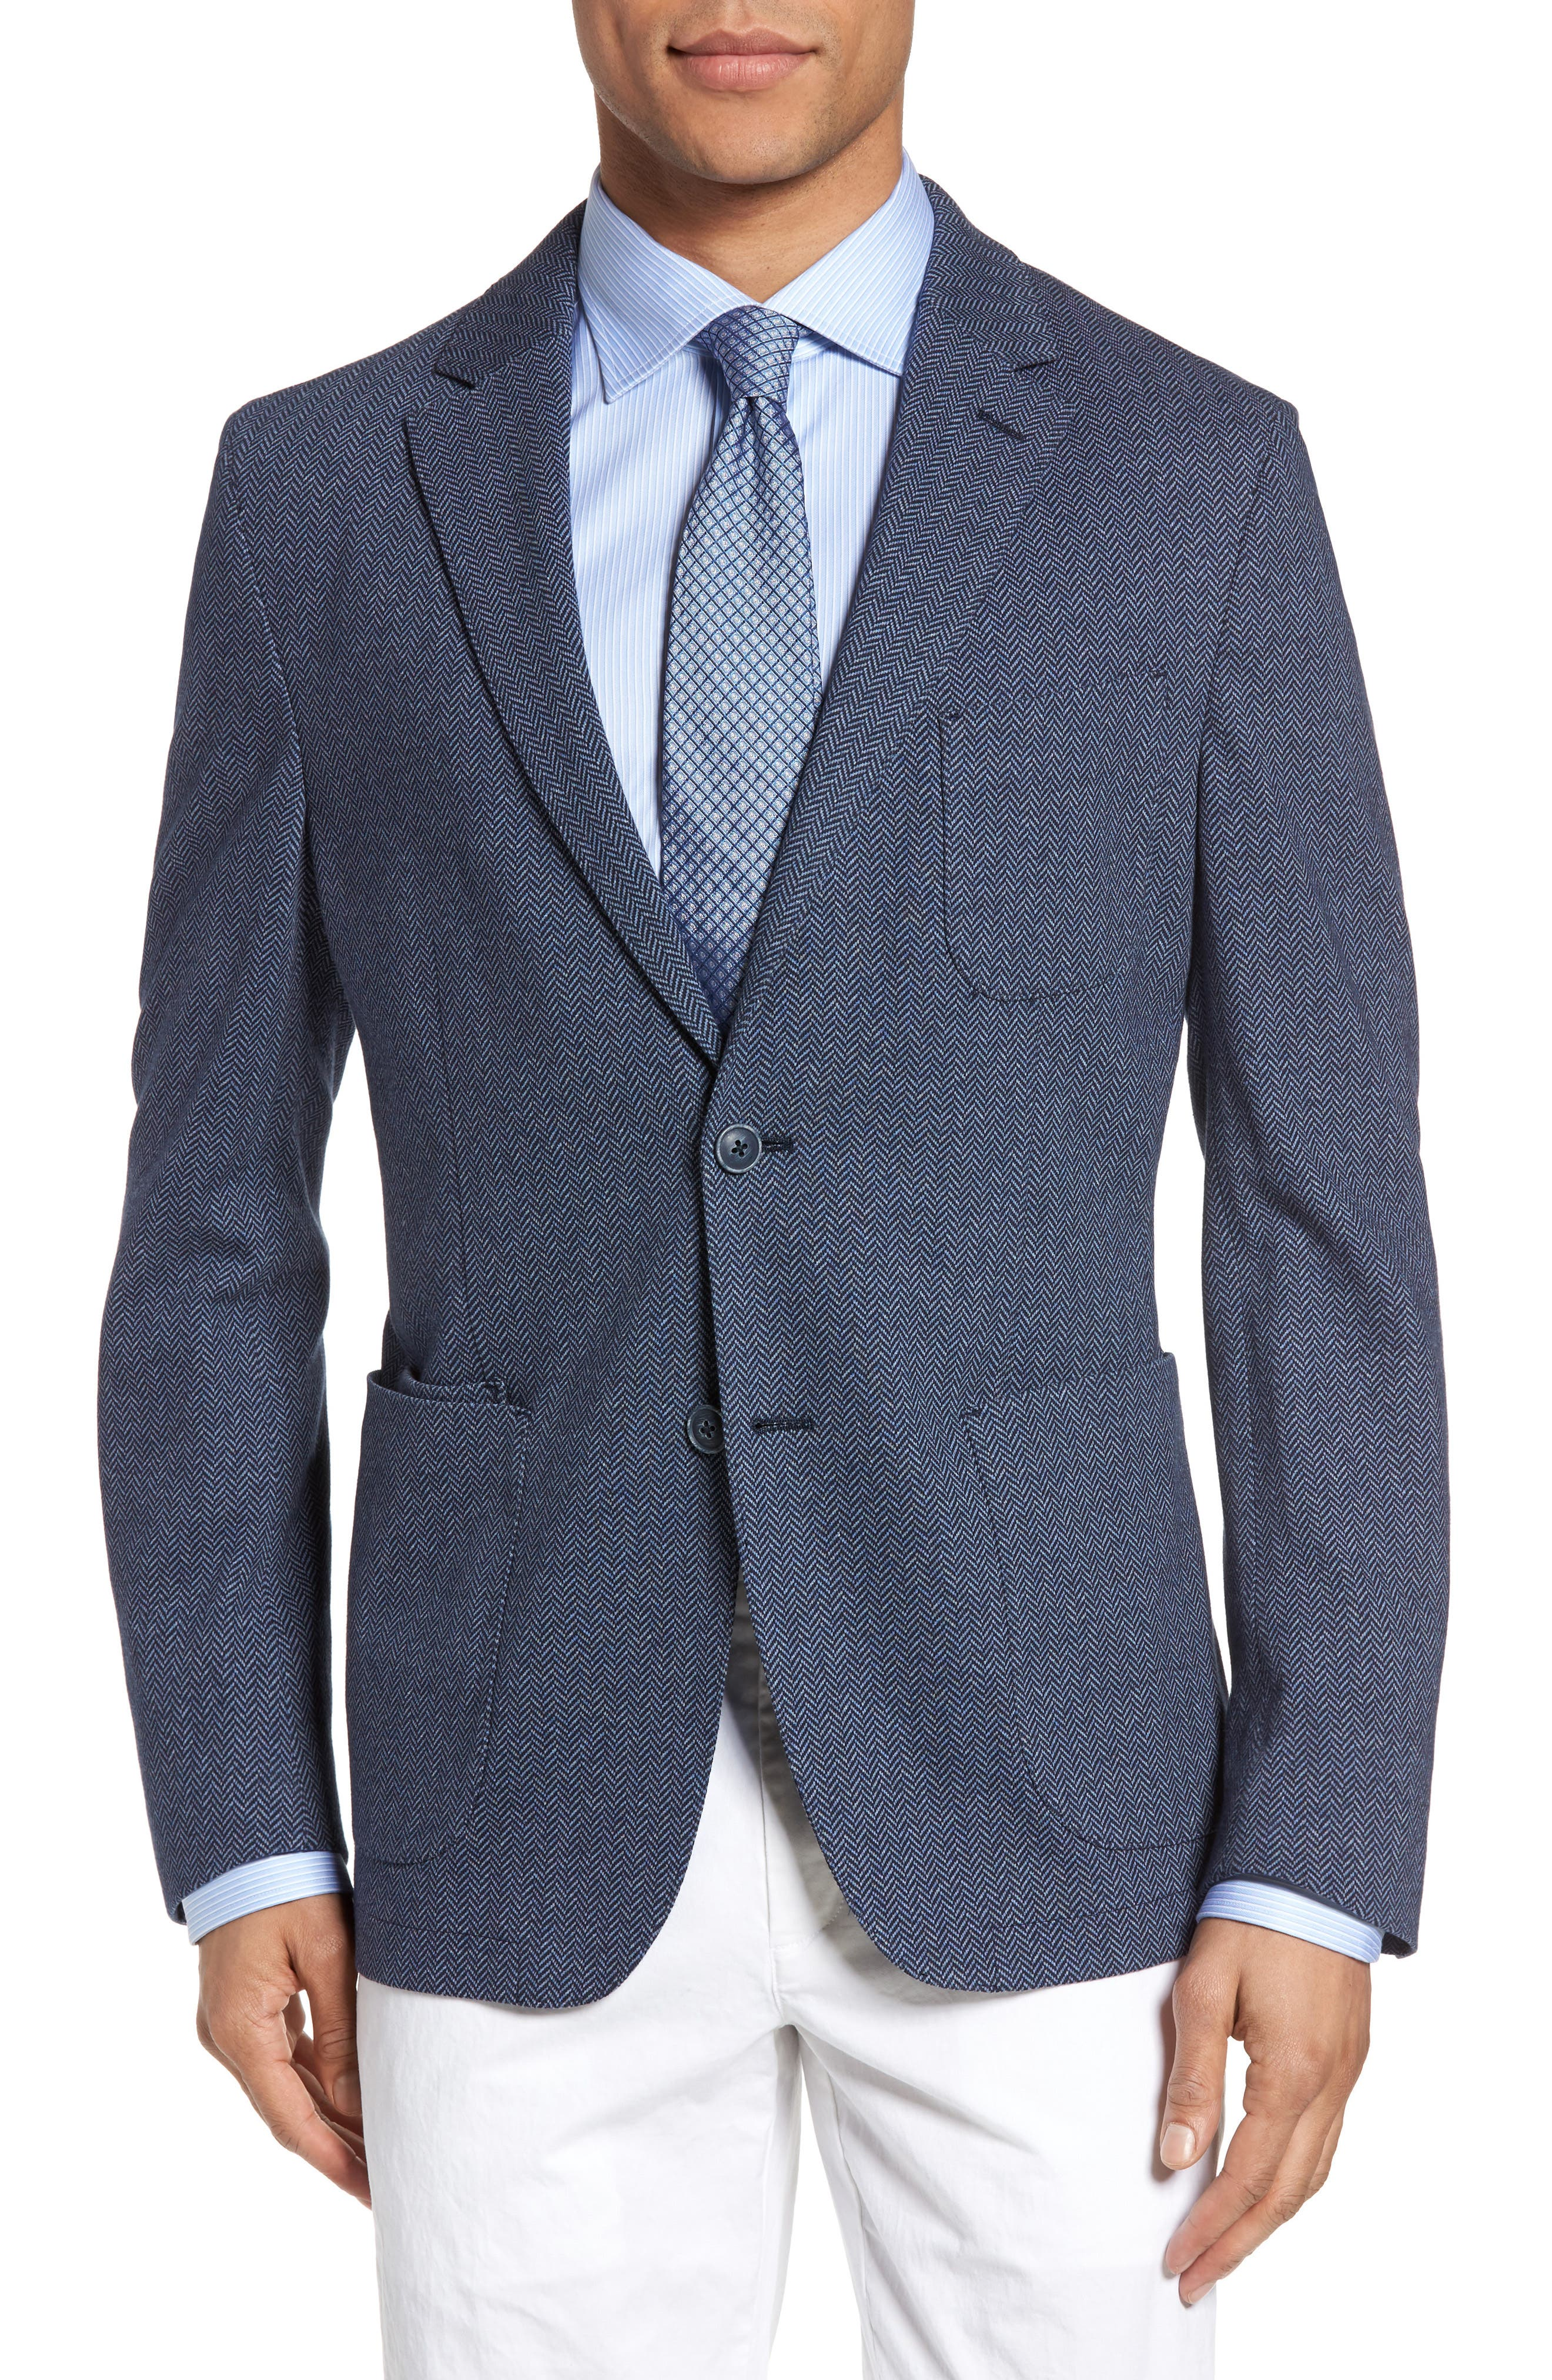 Draper Herringbone Sport Coat,                         Main,                         color, Navy